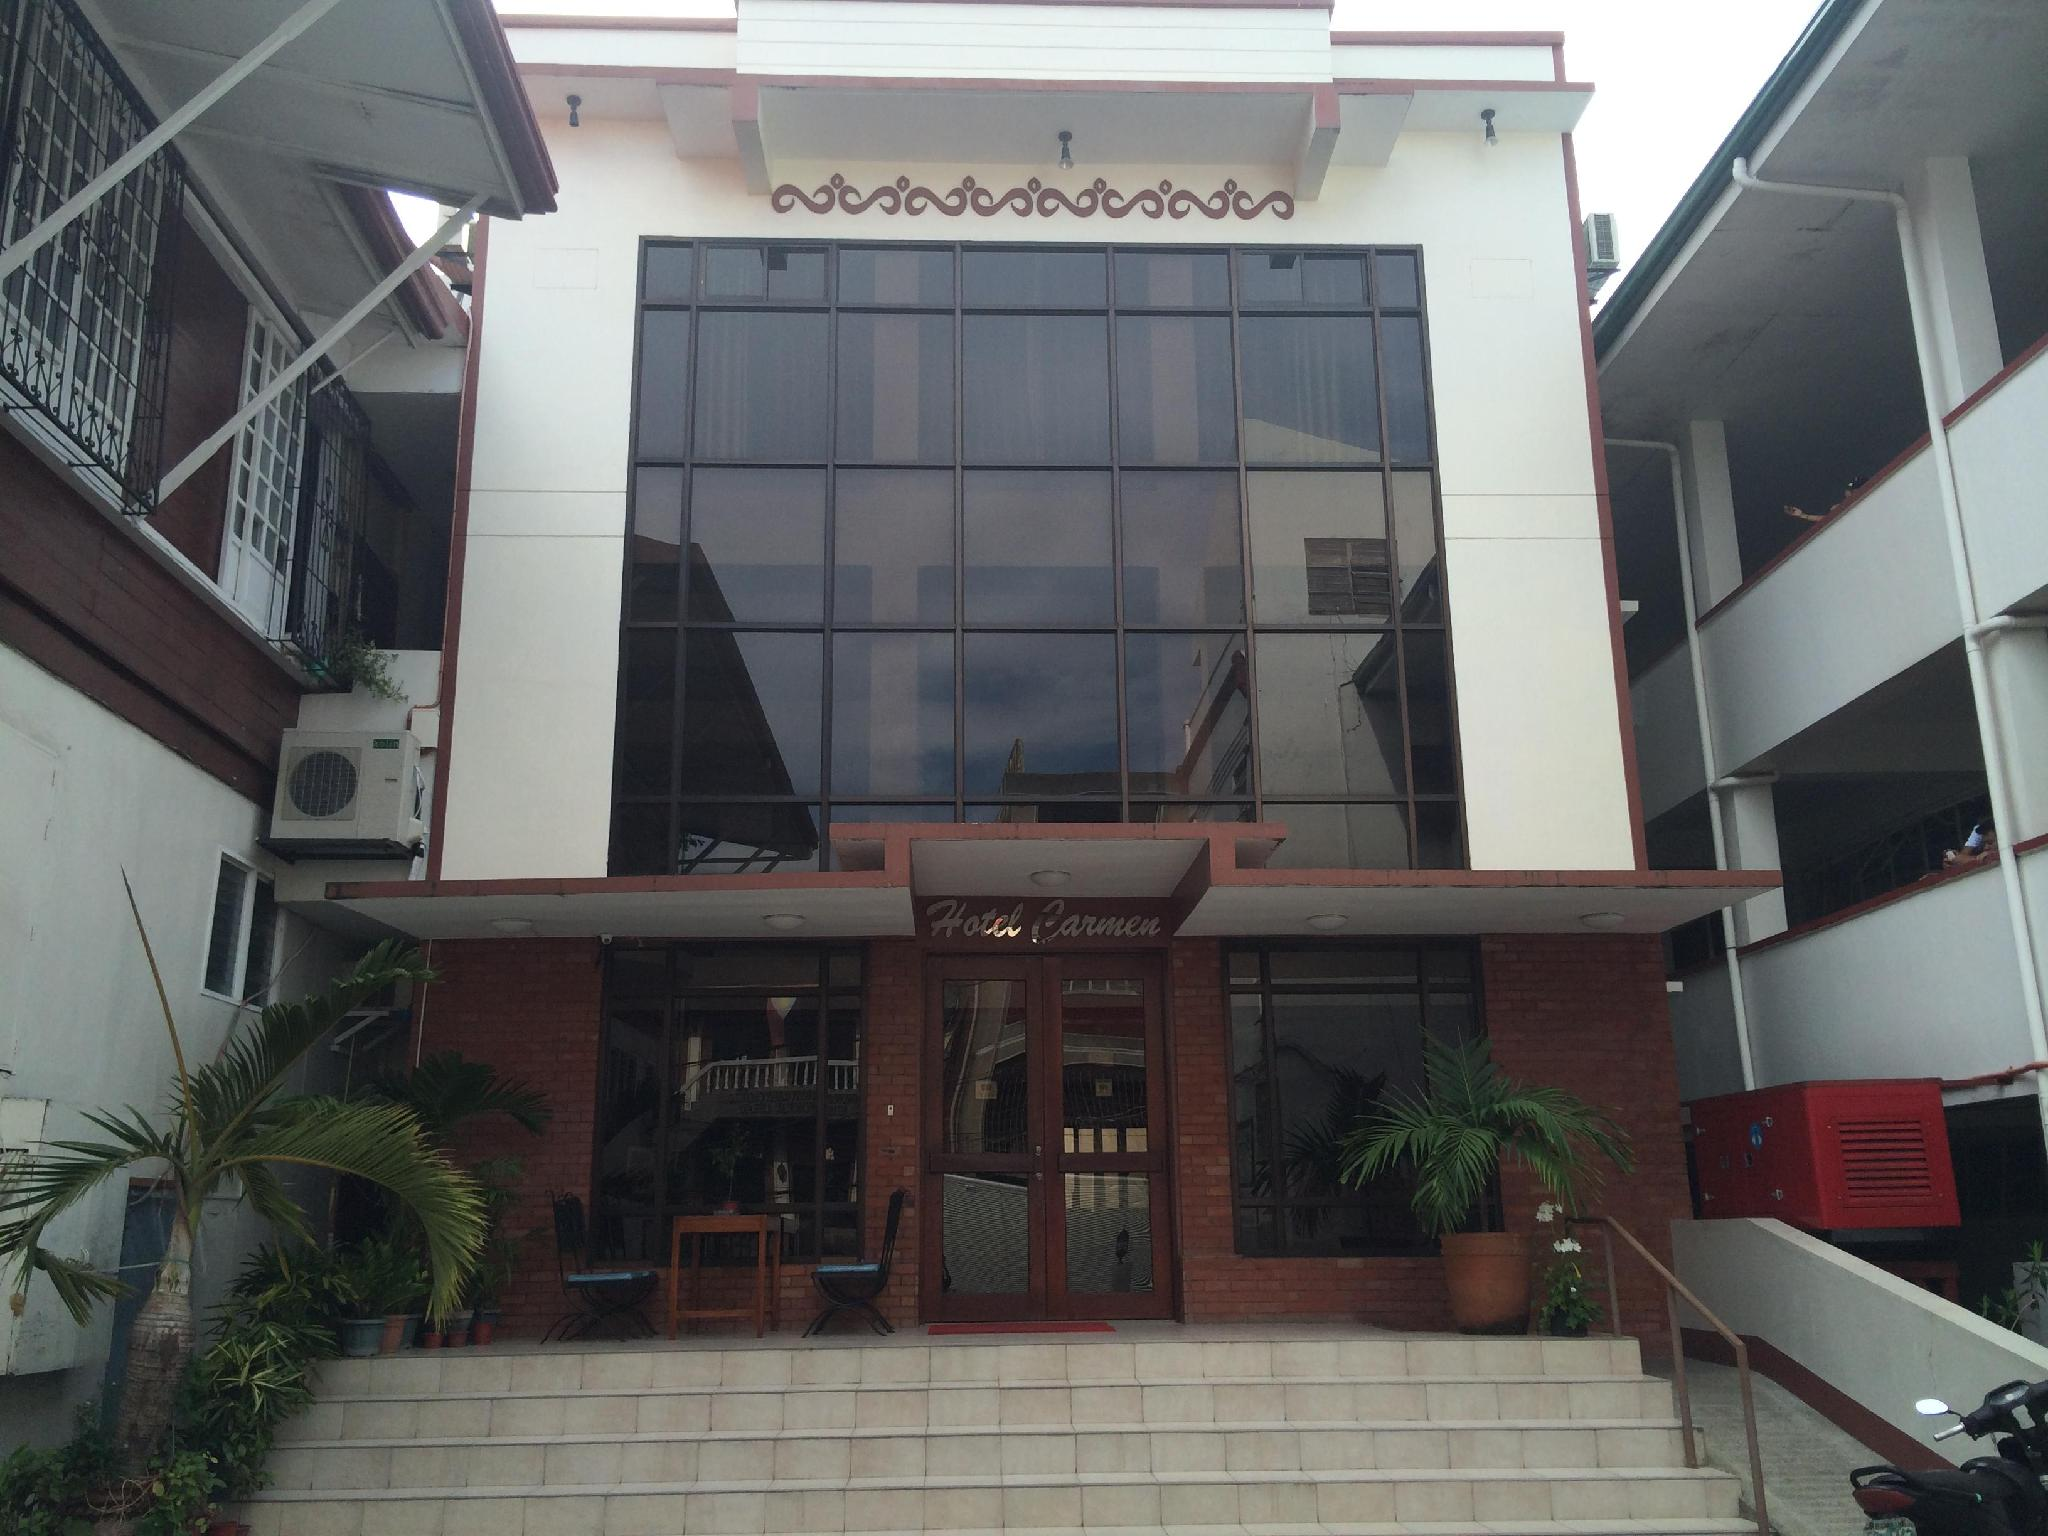 Hotel Carmen at NVC, Kalibo